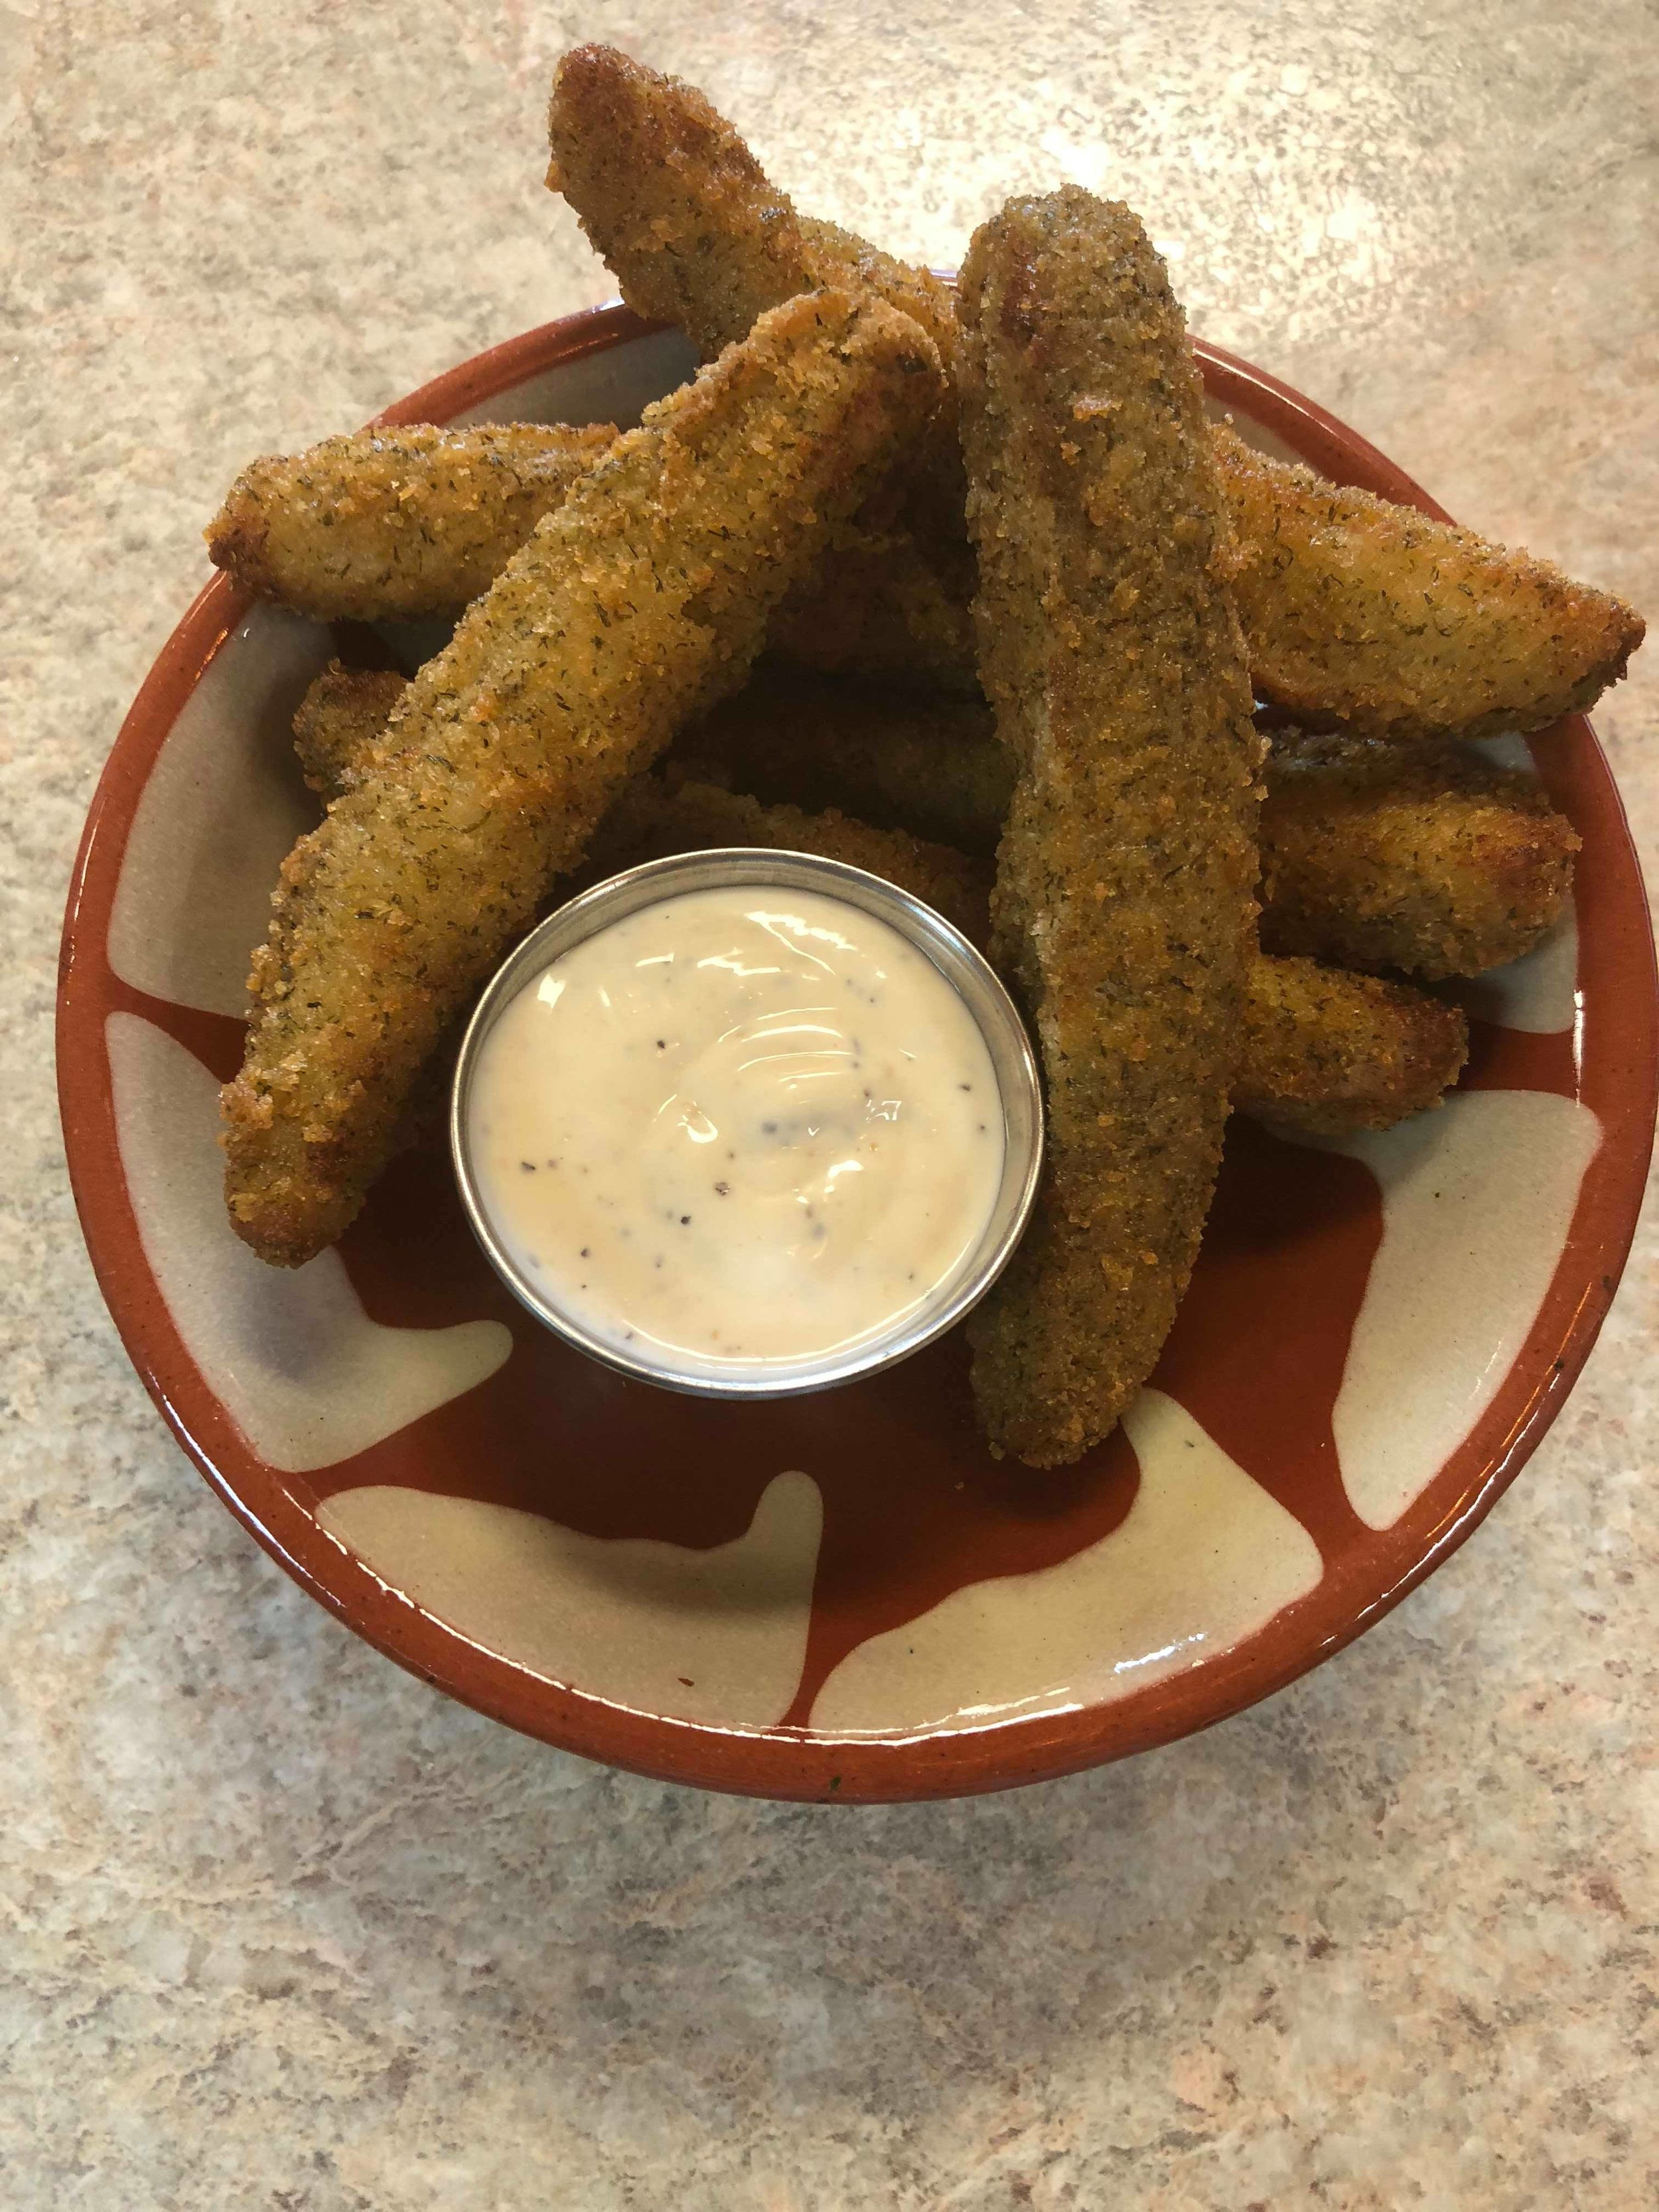 SIDES - Fresh Cut Fries - $4.45Garlic Potatoes - $4.45Poutine - $5.49Onion Rings - $4.99Deep Fried Pickles - $5.99Stuffed Grape Leaves - $3.99